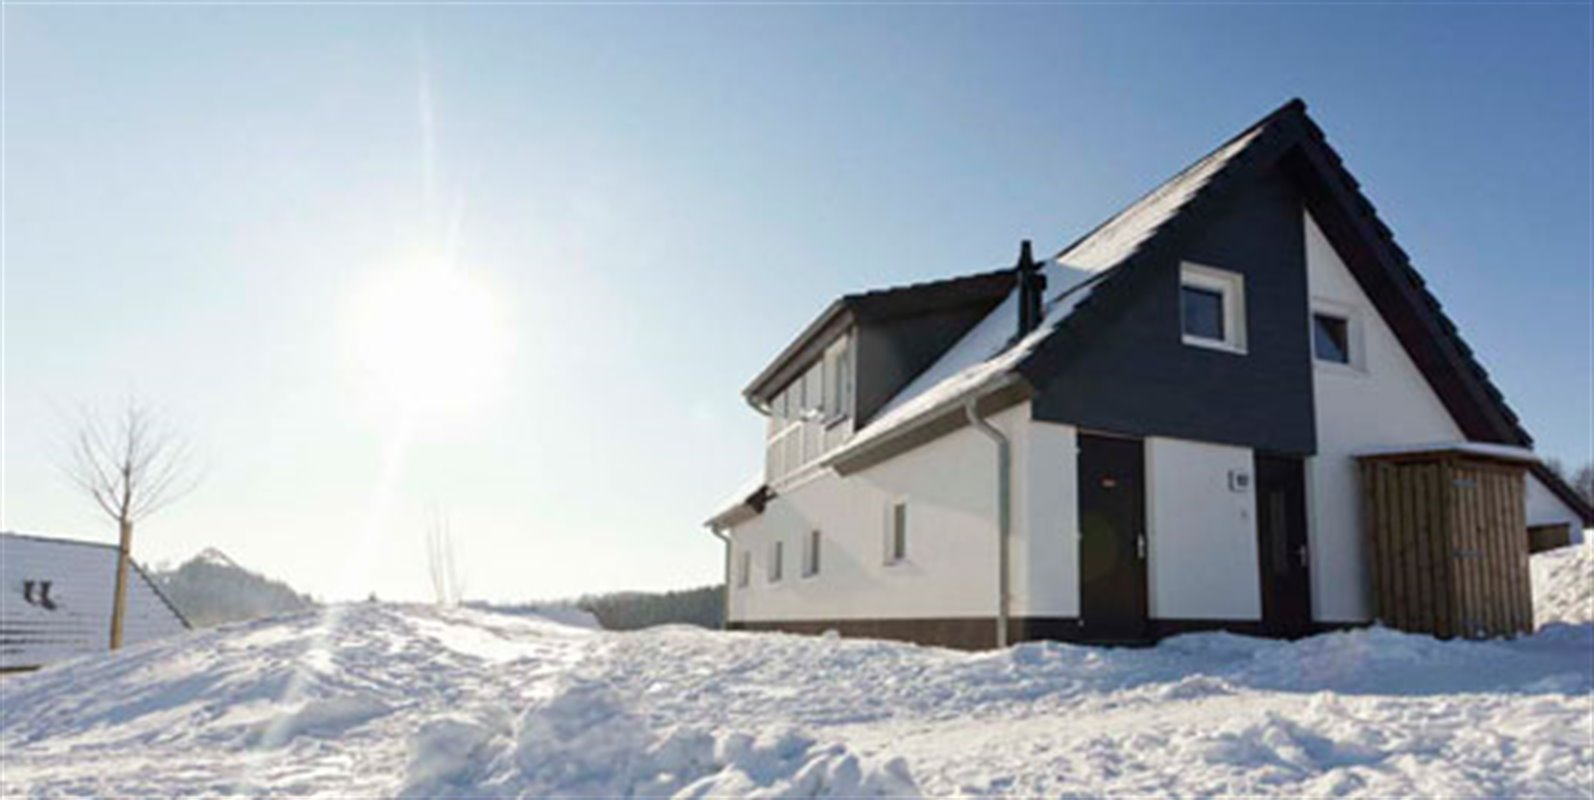 Landal Winterberg   12-Pers.-Ferienhaus - Luxus...